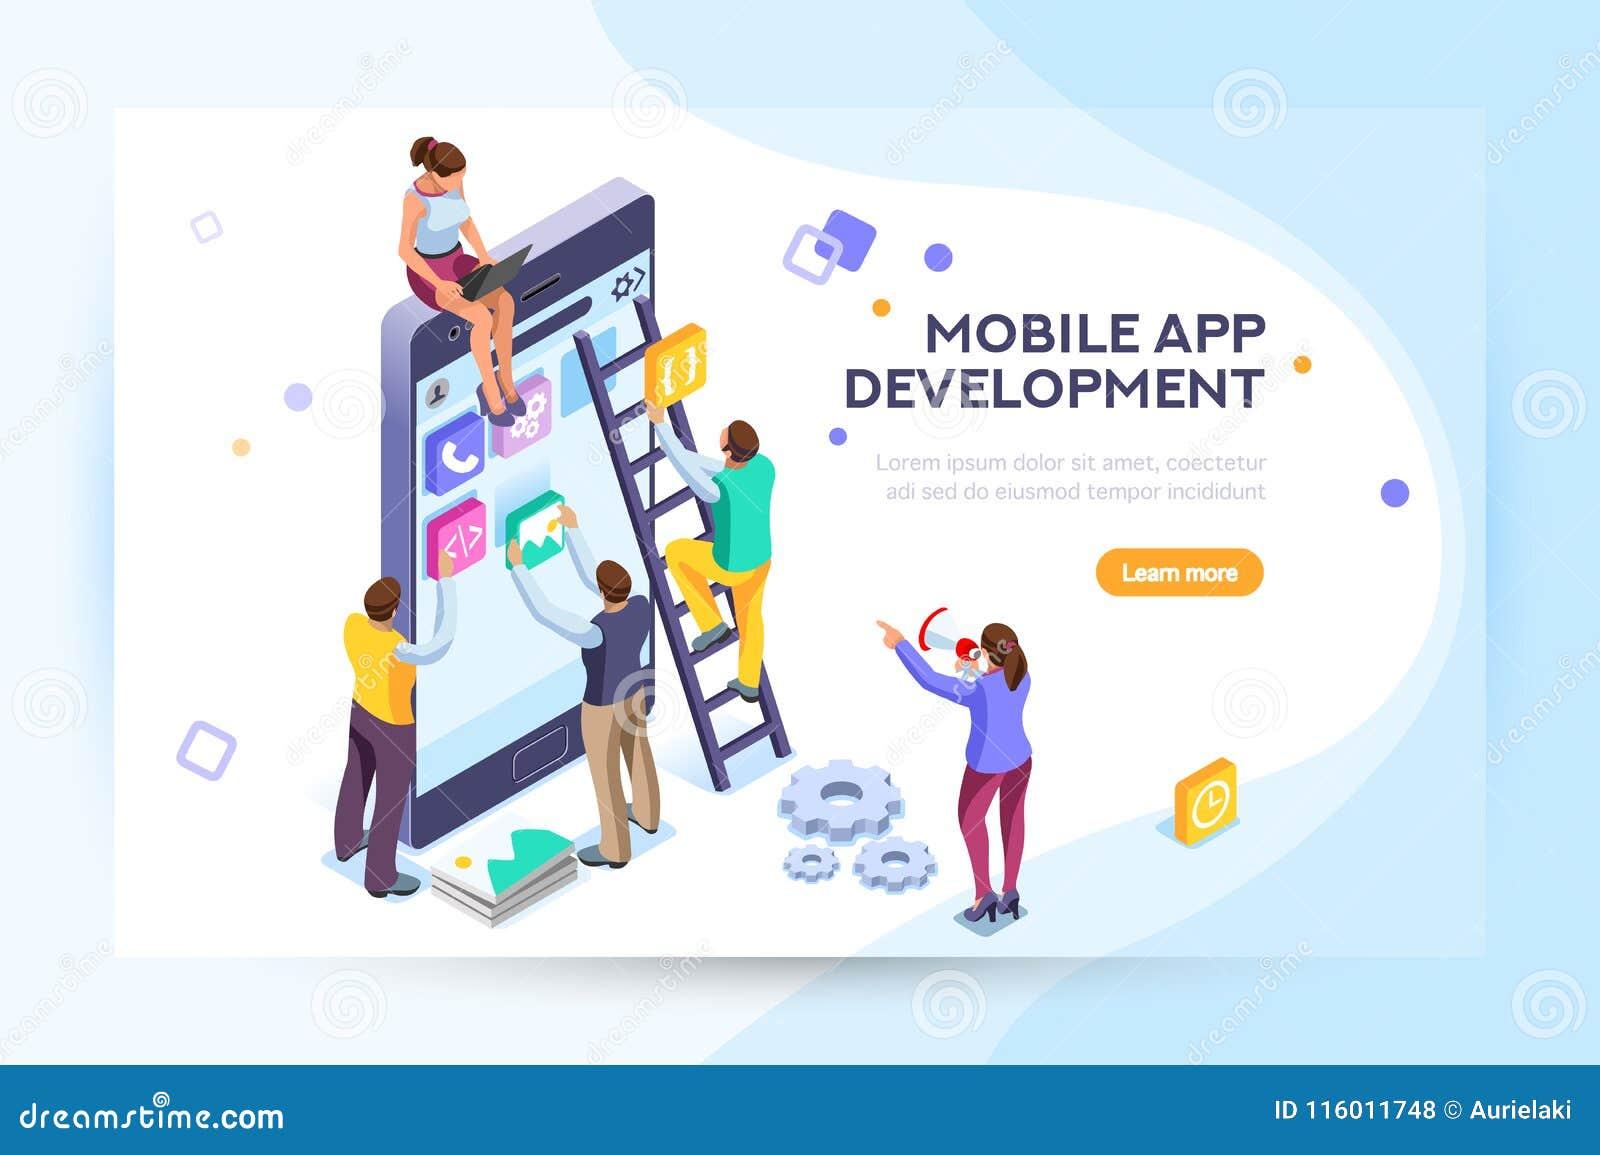 Mobile Application User And Developers Stock Vector - Illustration ... 6b10ef7d5